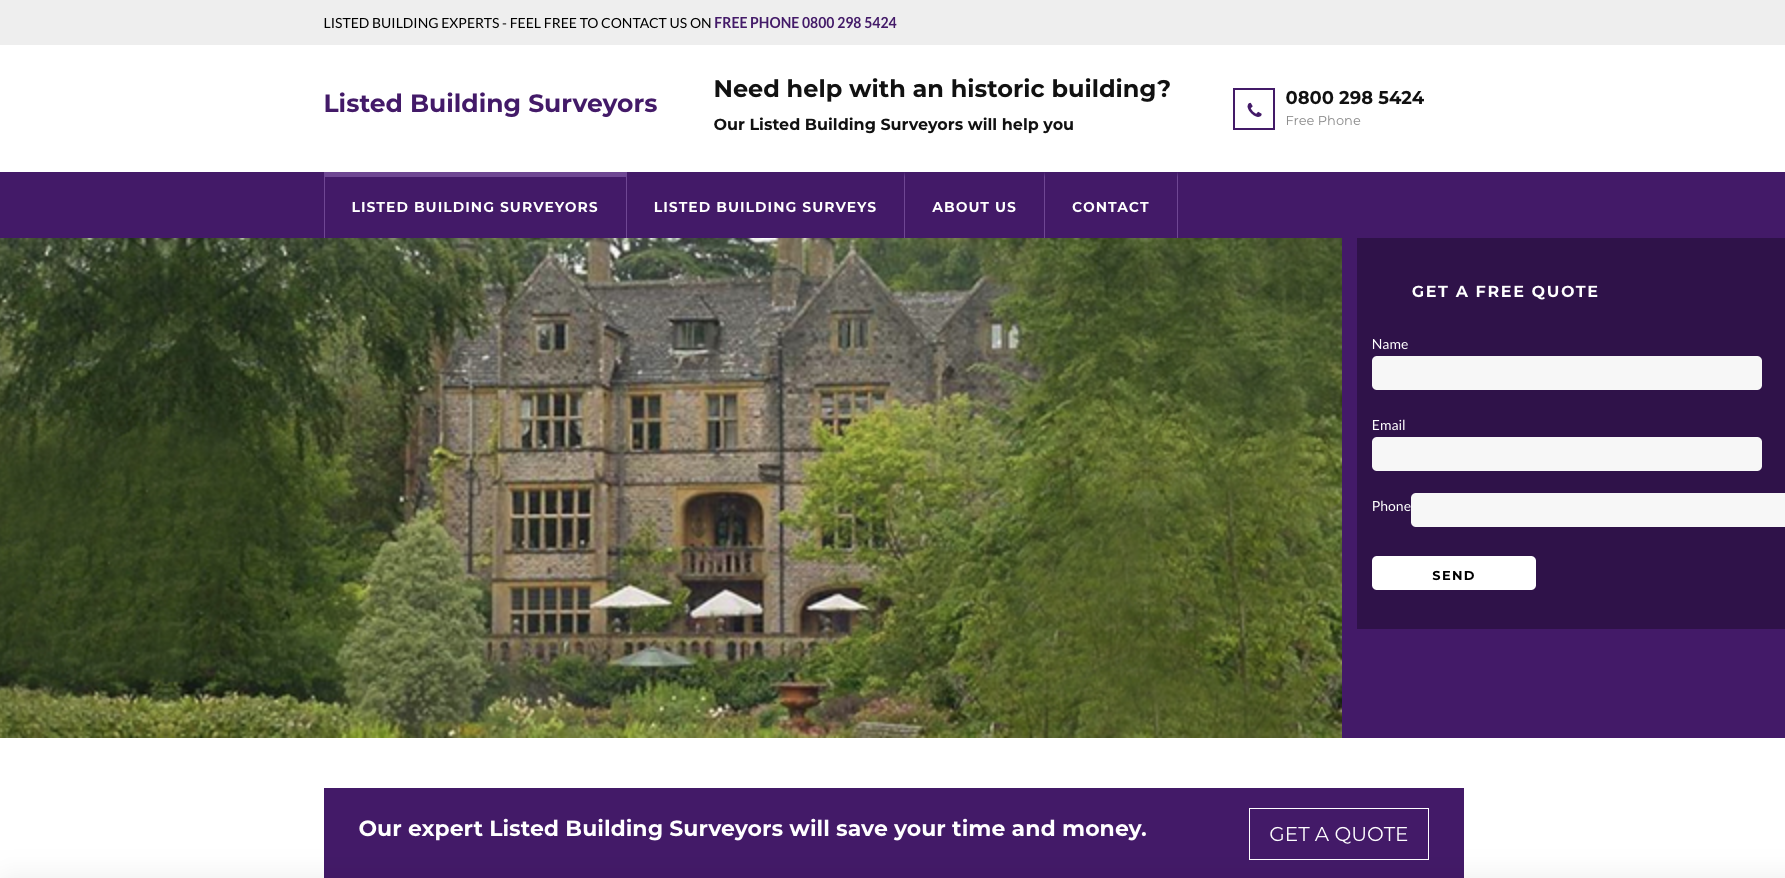 Take a Look at www.britishlistedbuildingsurveys.co.uk